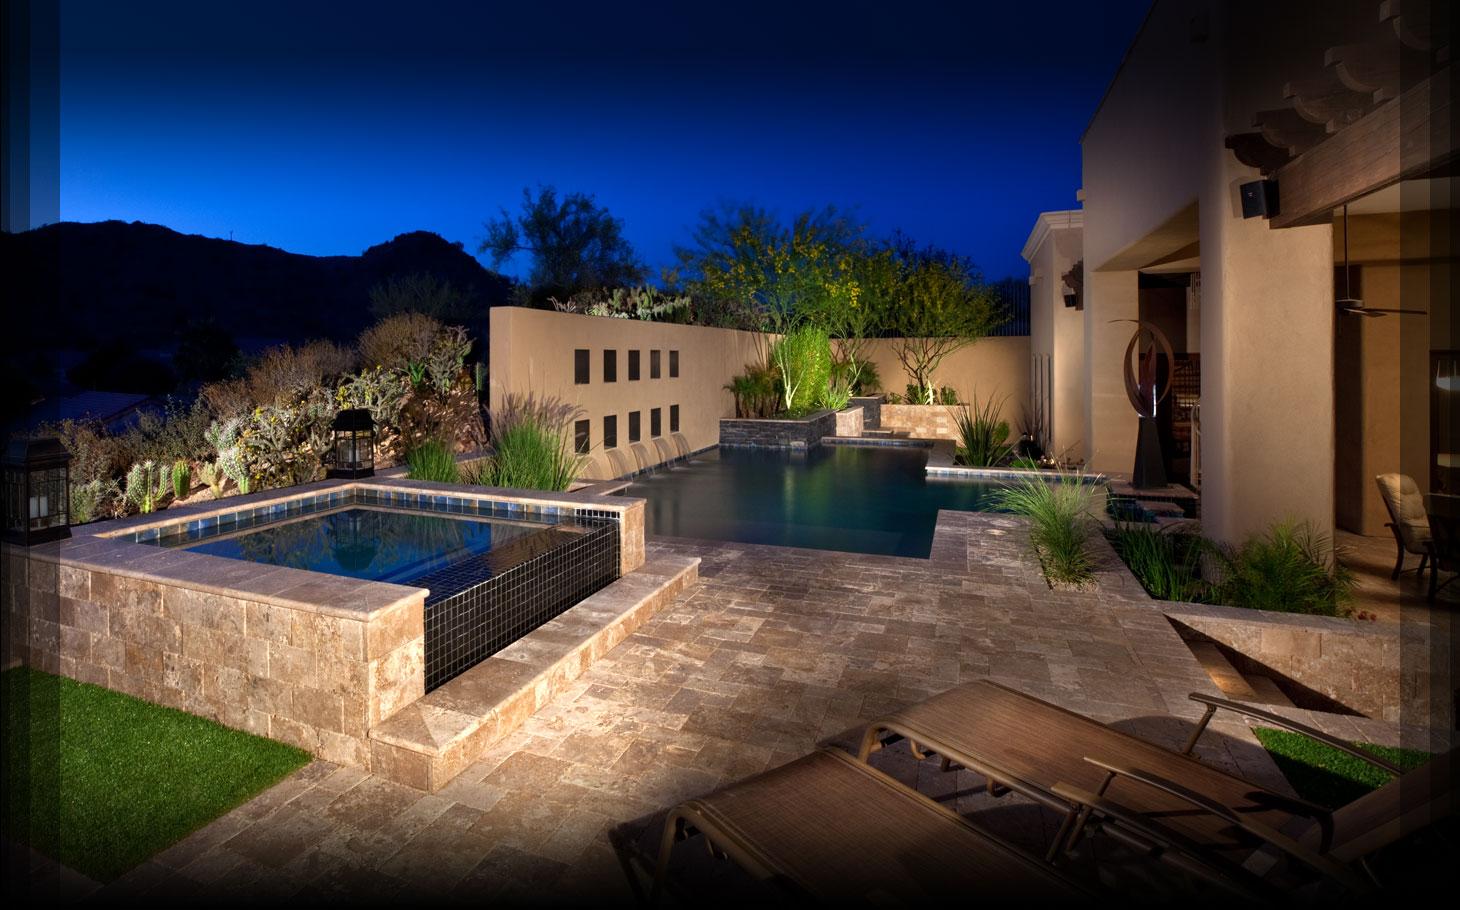 Free Download You Can Download Landscape Design Companies In Phoenix Az In Your 1460x910 For Your Desktop Mobile Tablet Explore 48 Wallpaper Design Companies Major Wallpaper Companies Wallpaper Companies